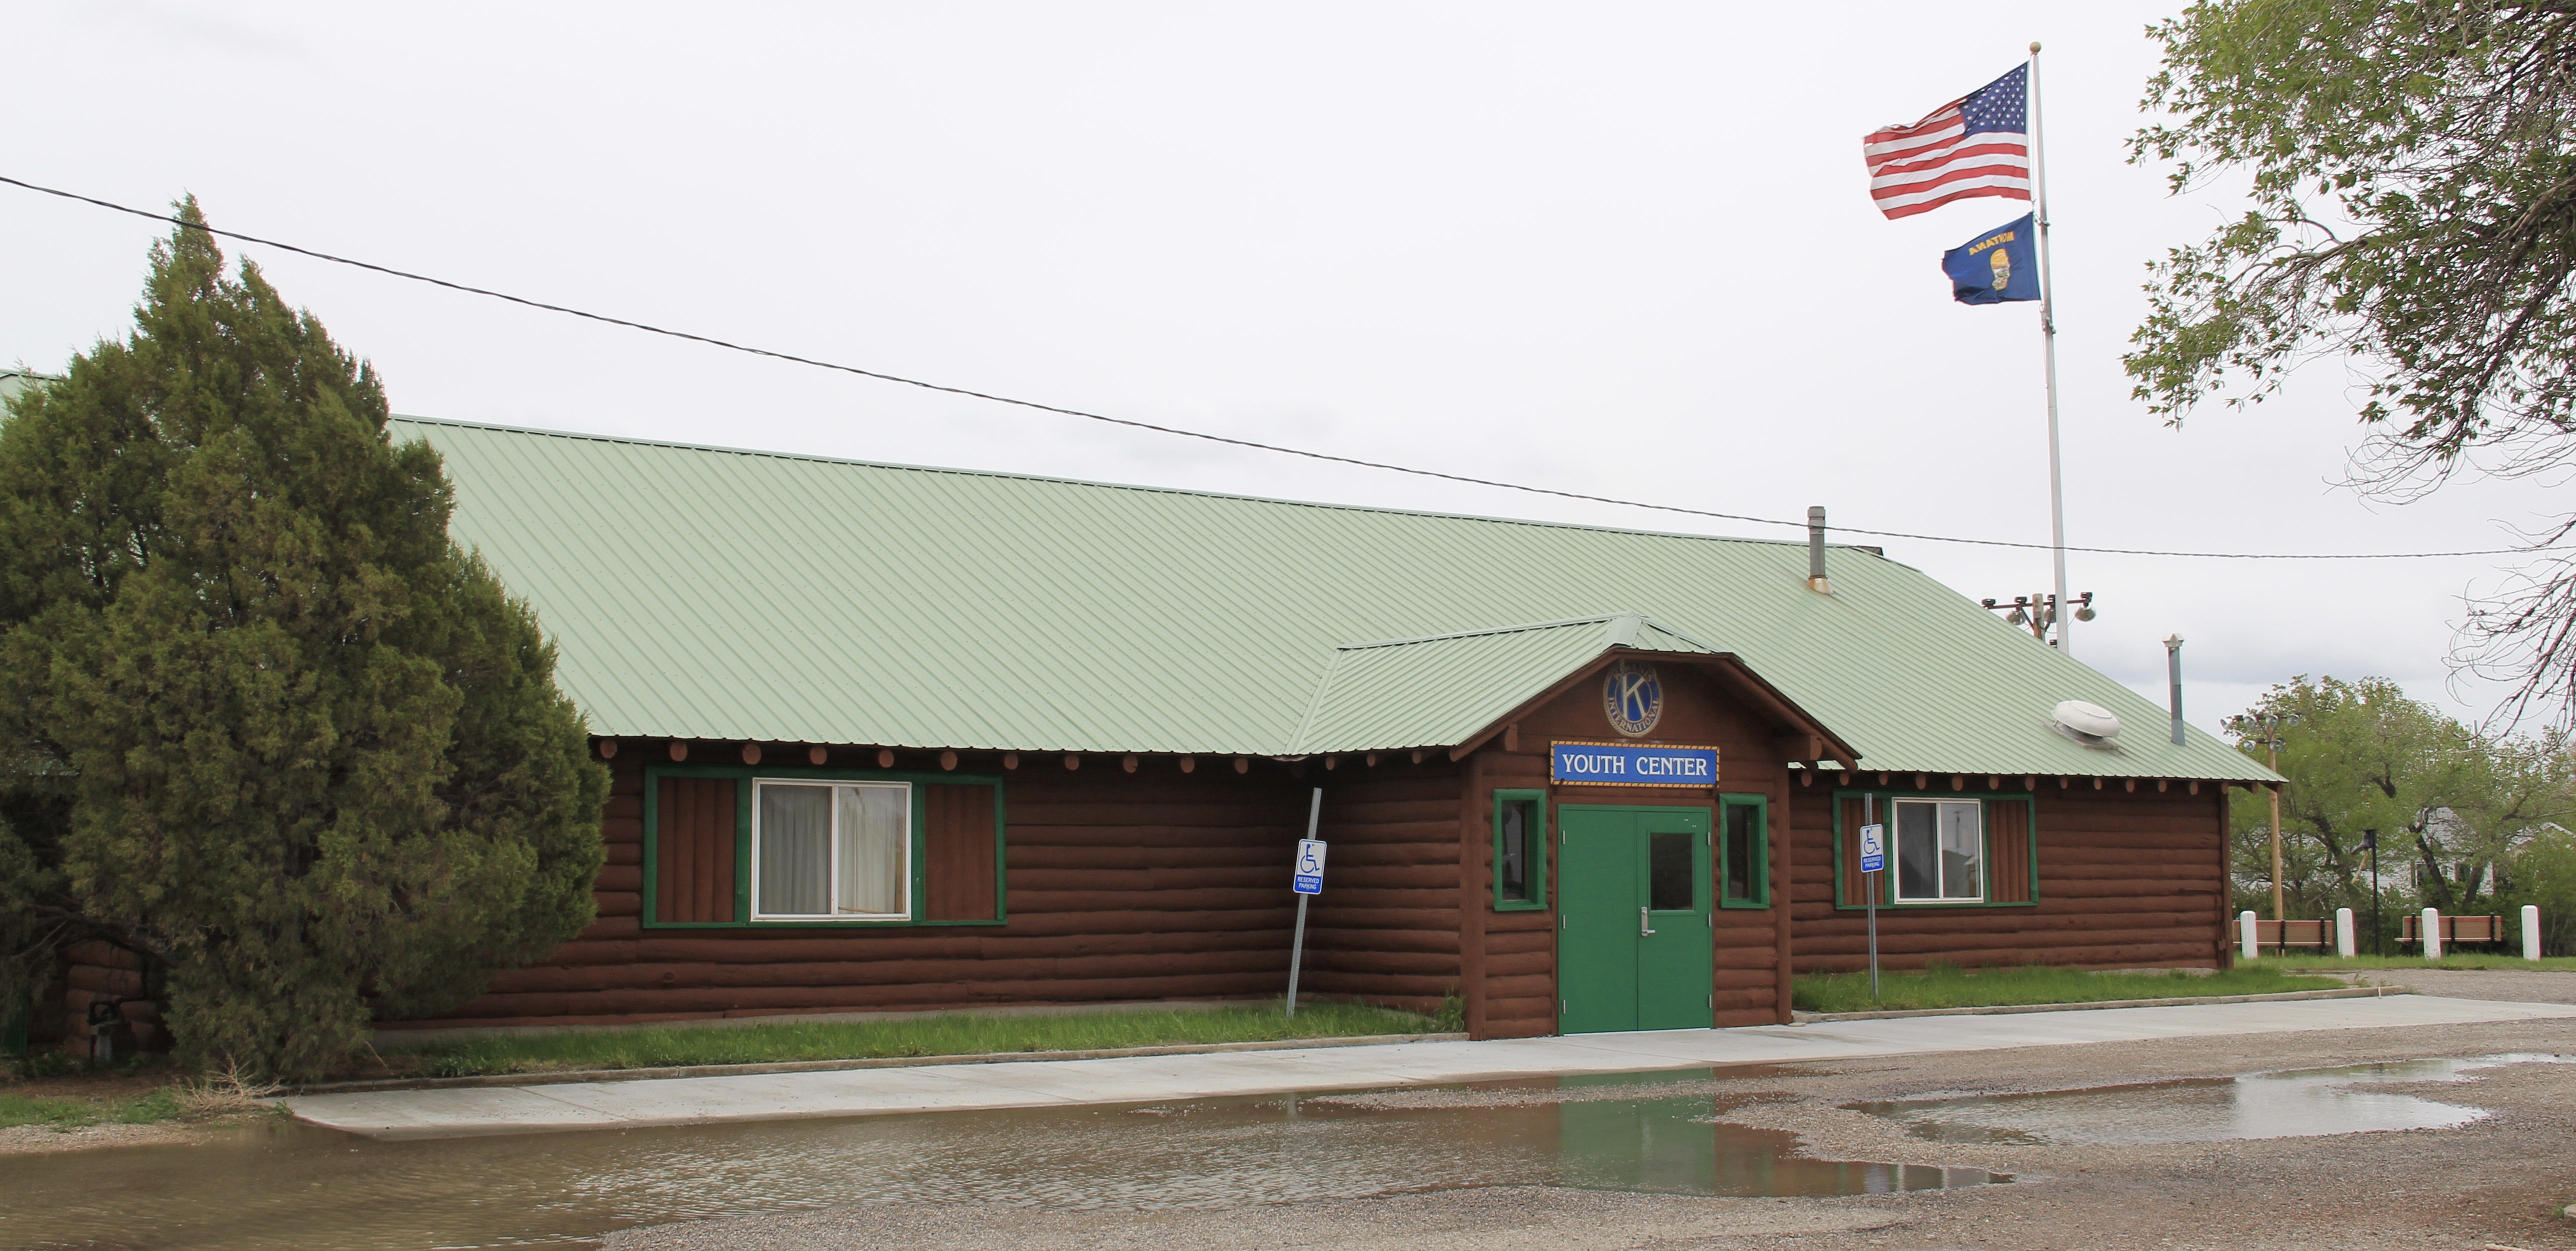 Wheatland Co Harlowton community hall 2